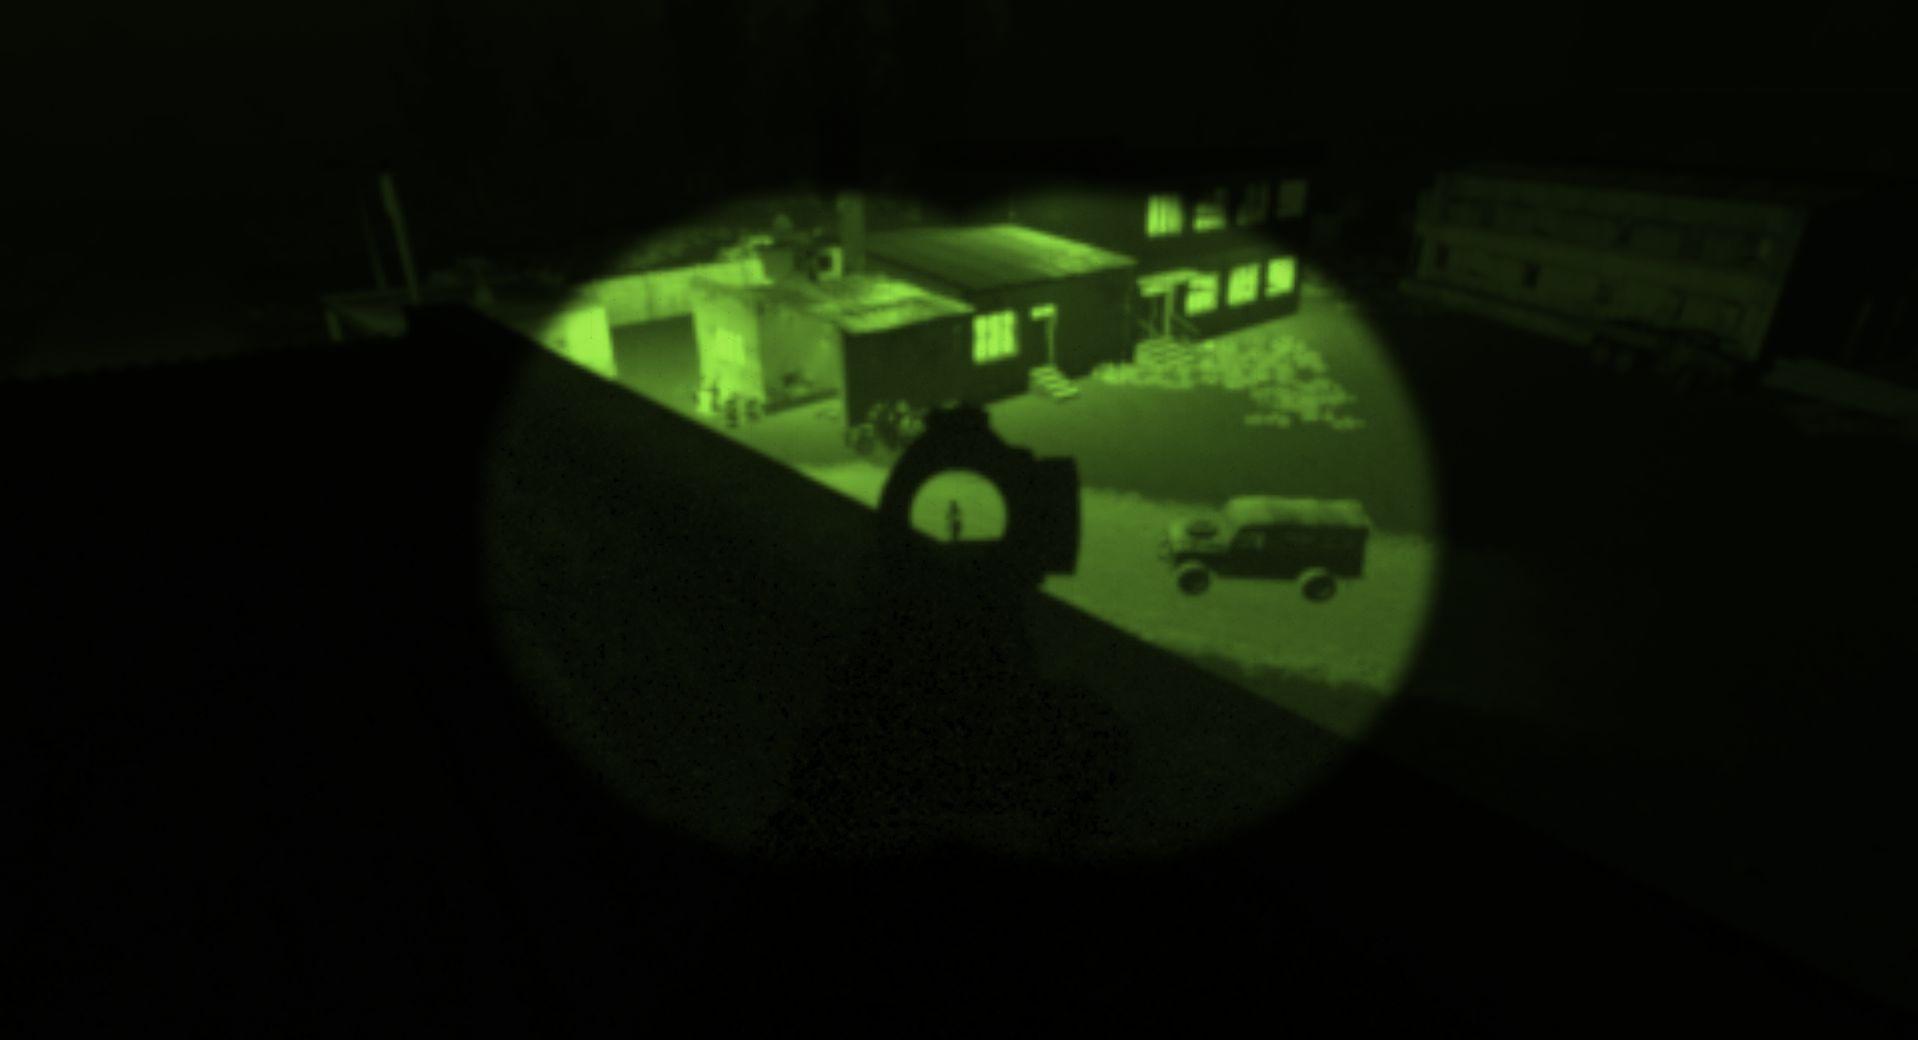 i.epvpimg.com/9GEFcab.jpg